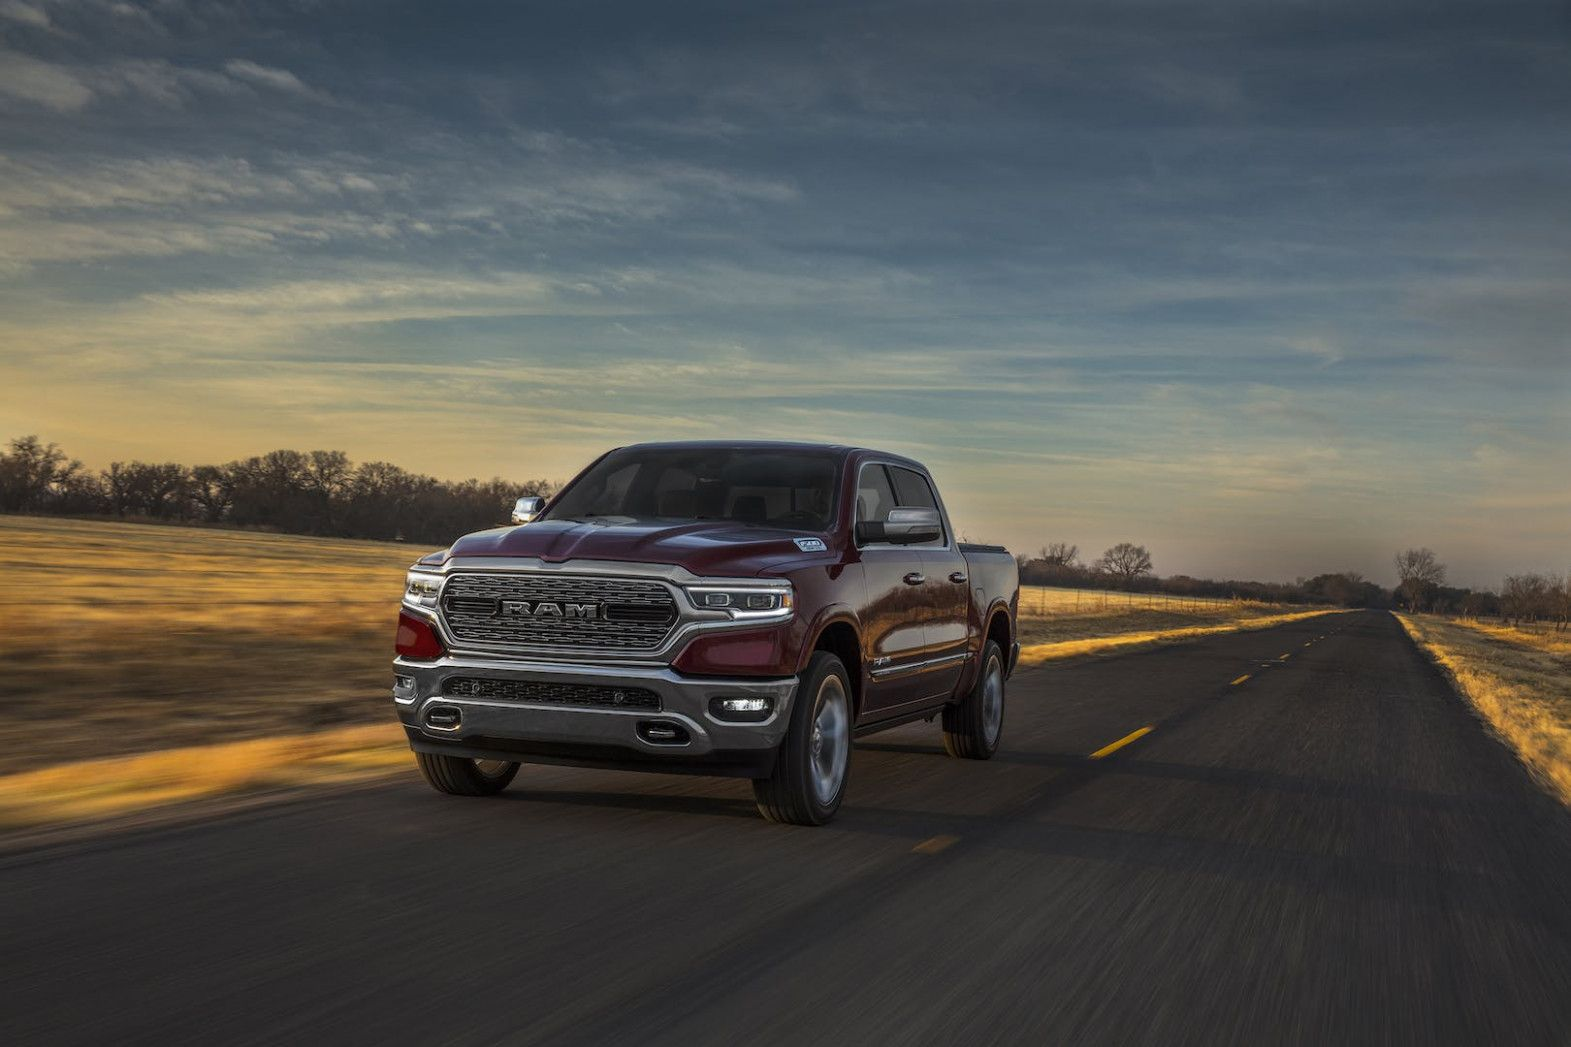 Dodge Ram 2020 Zubehor Ratings 2020 Car Reviews 2019 Ram 1500